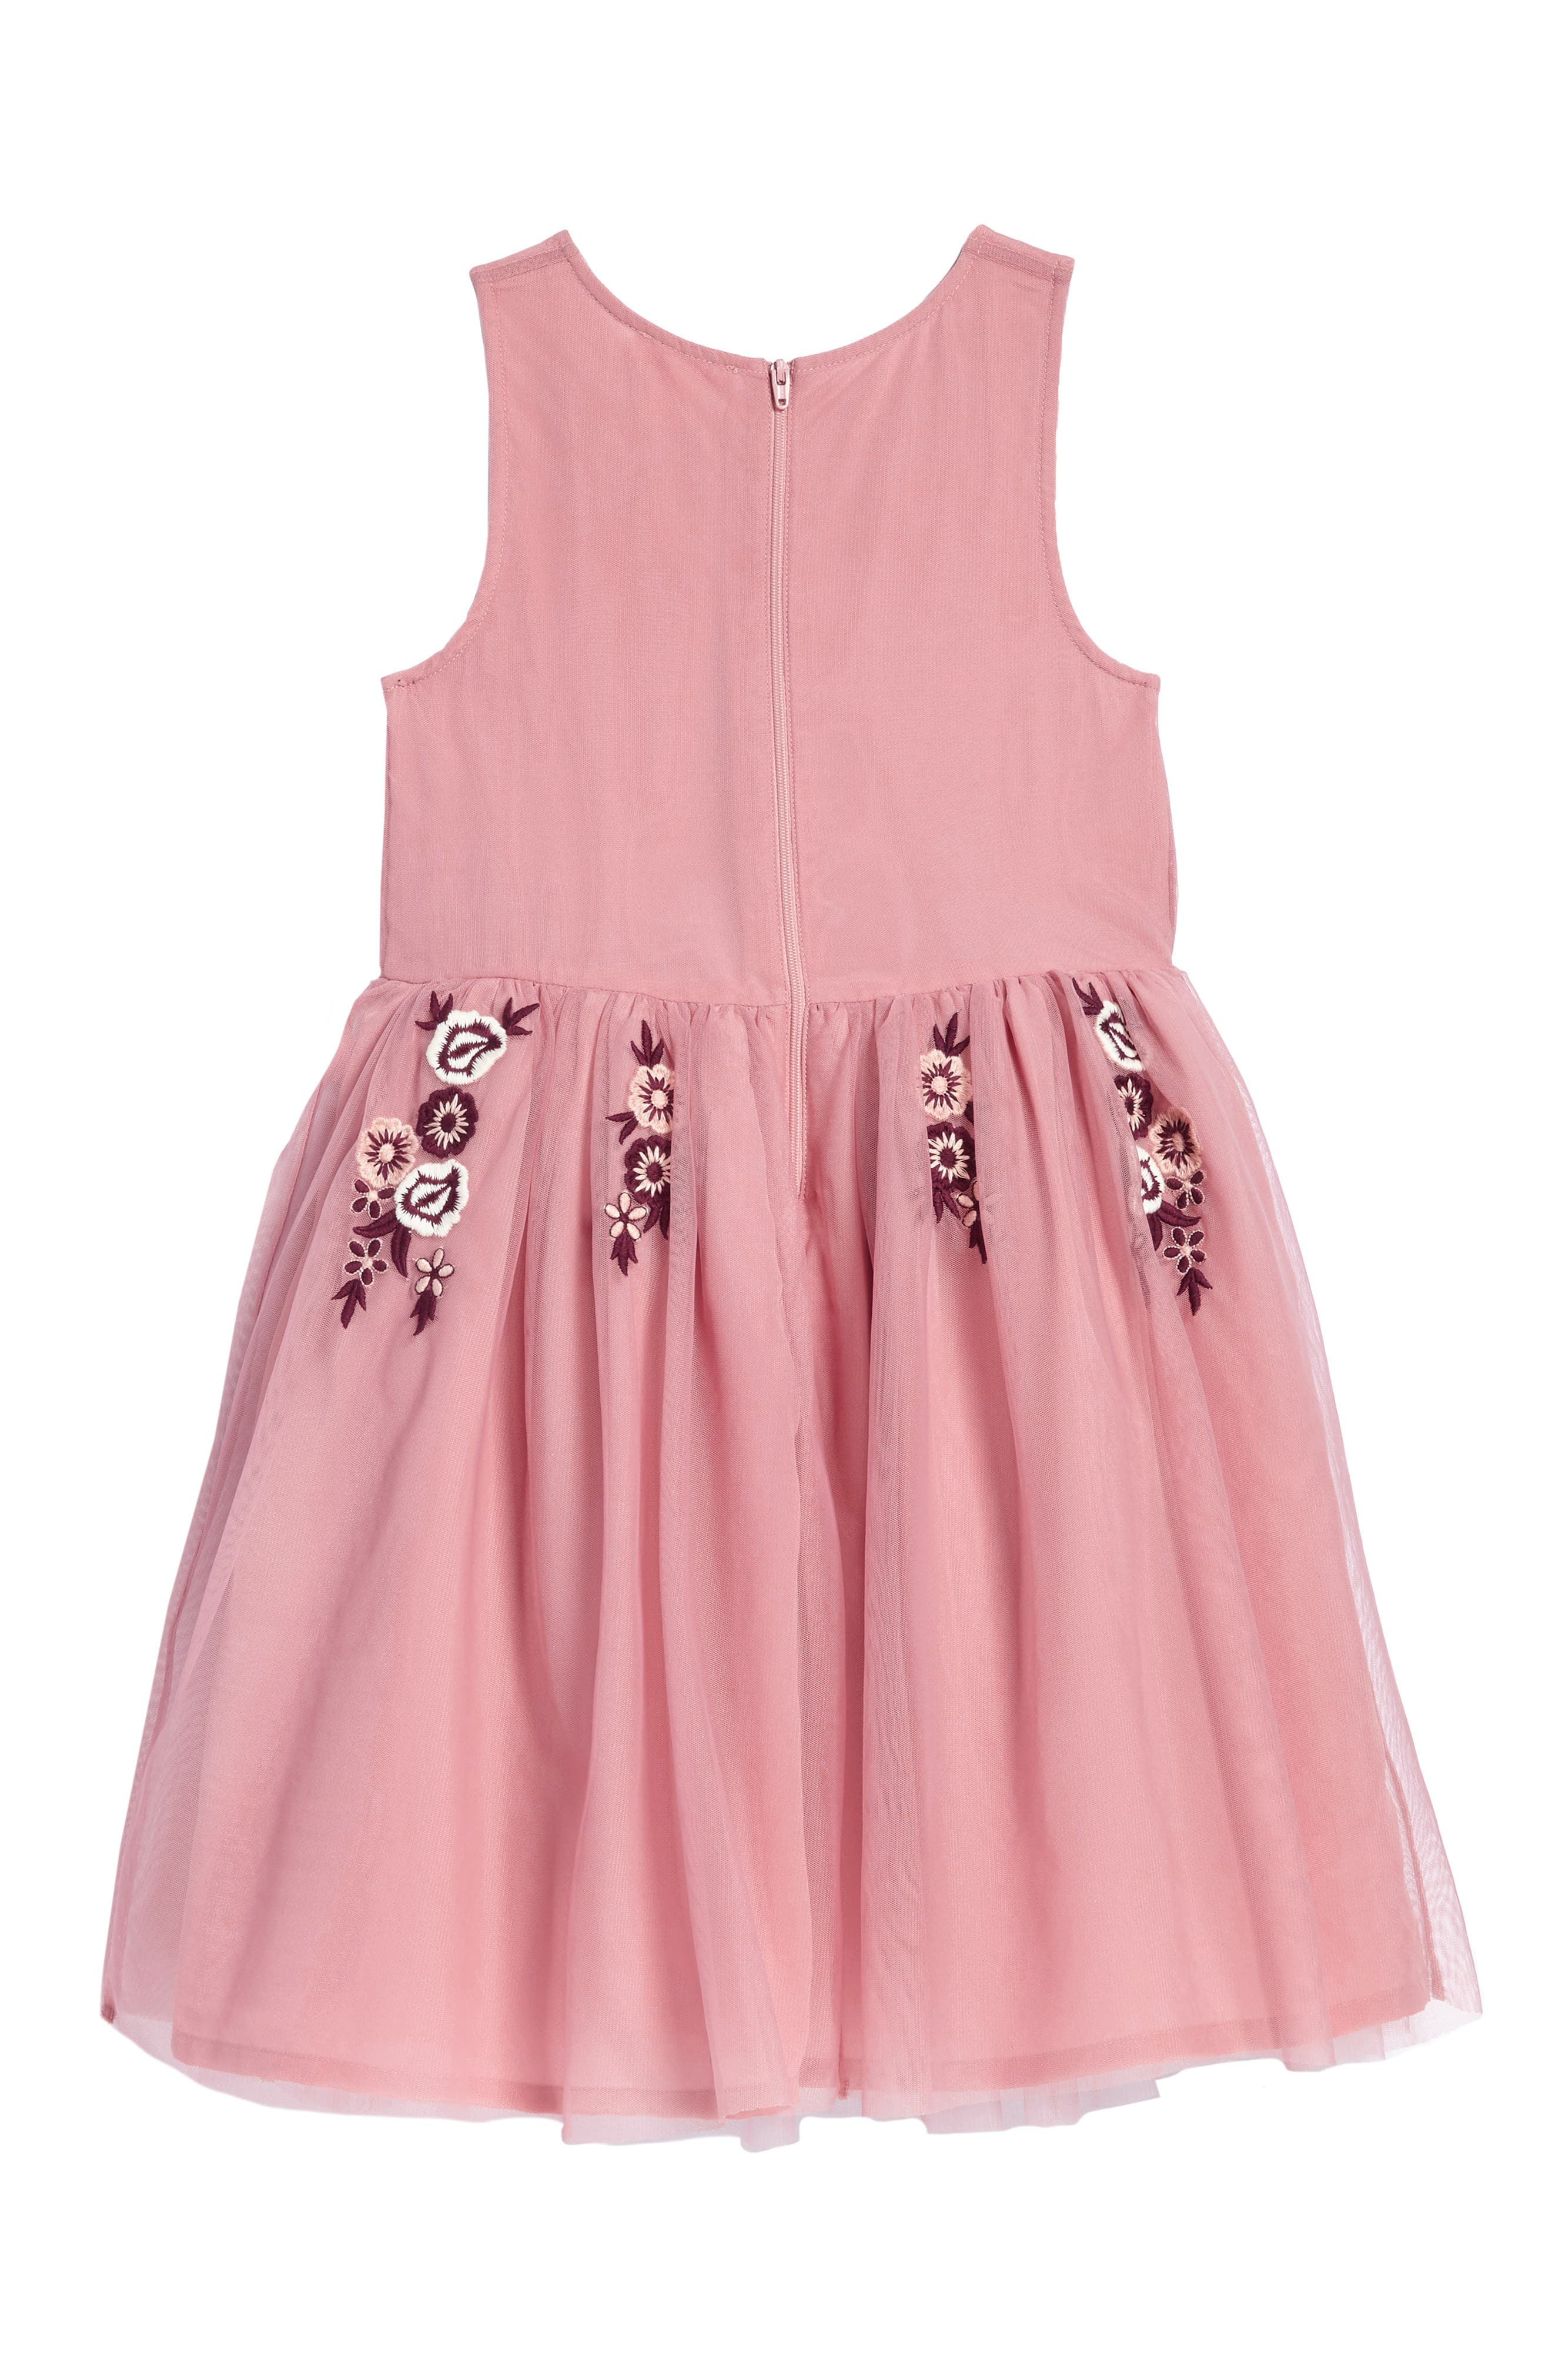 Flower Embroidered Dress,                             Alternate thumbnail 2, color,                             660